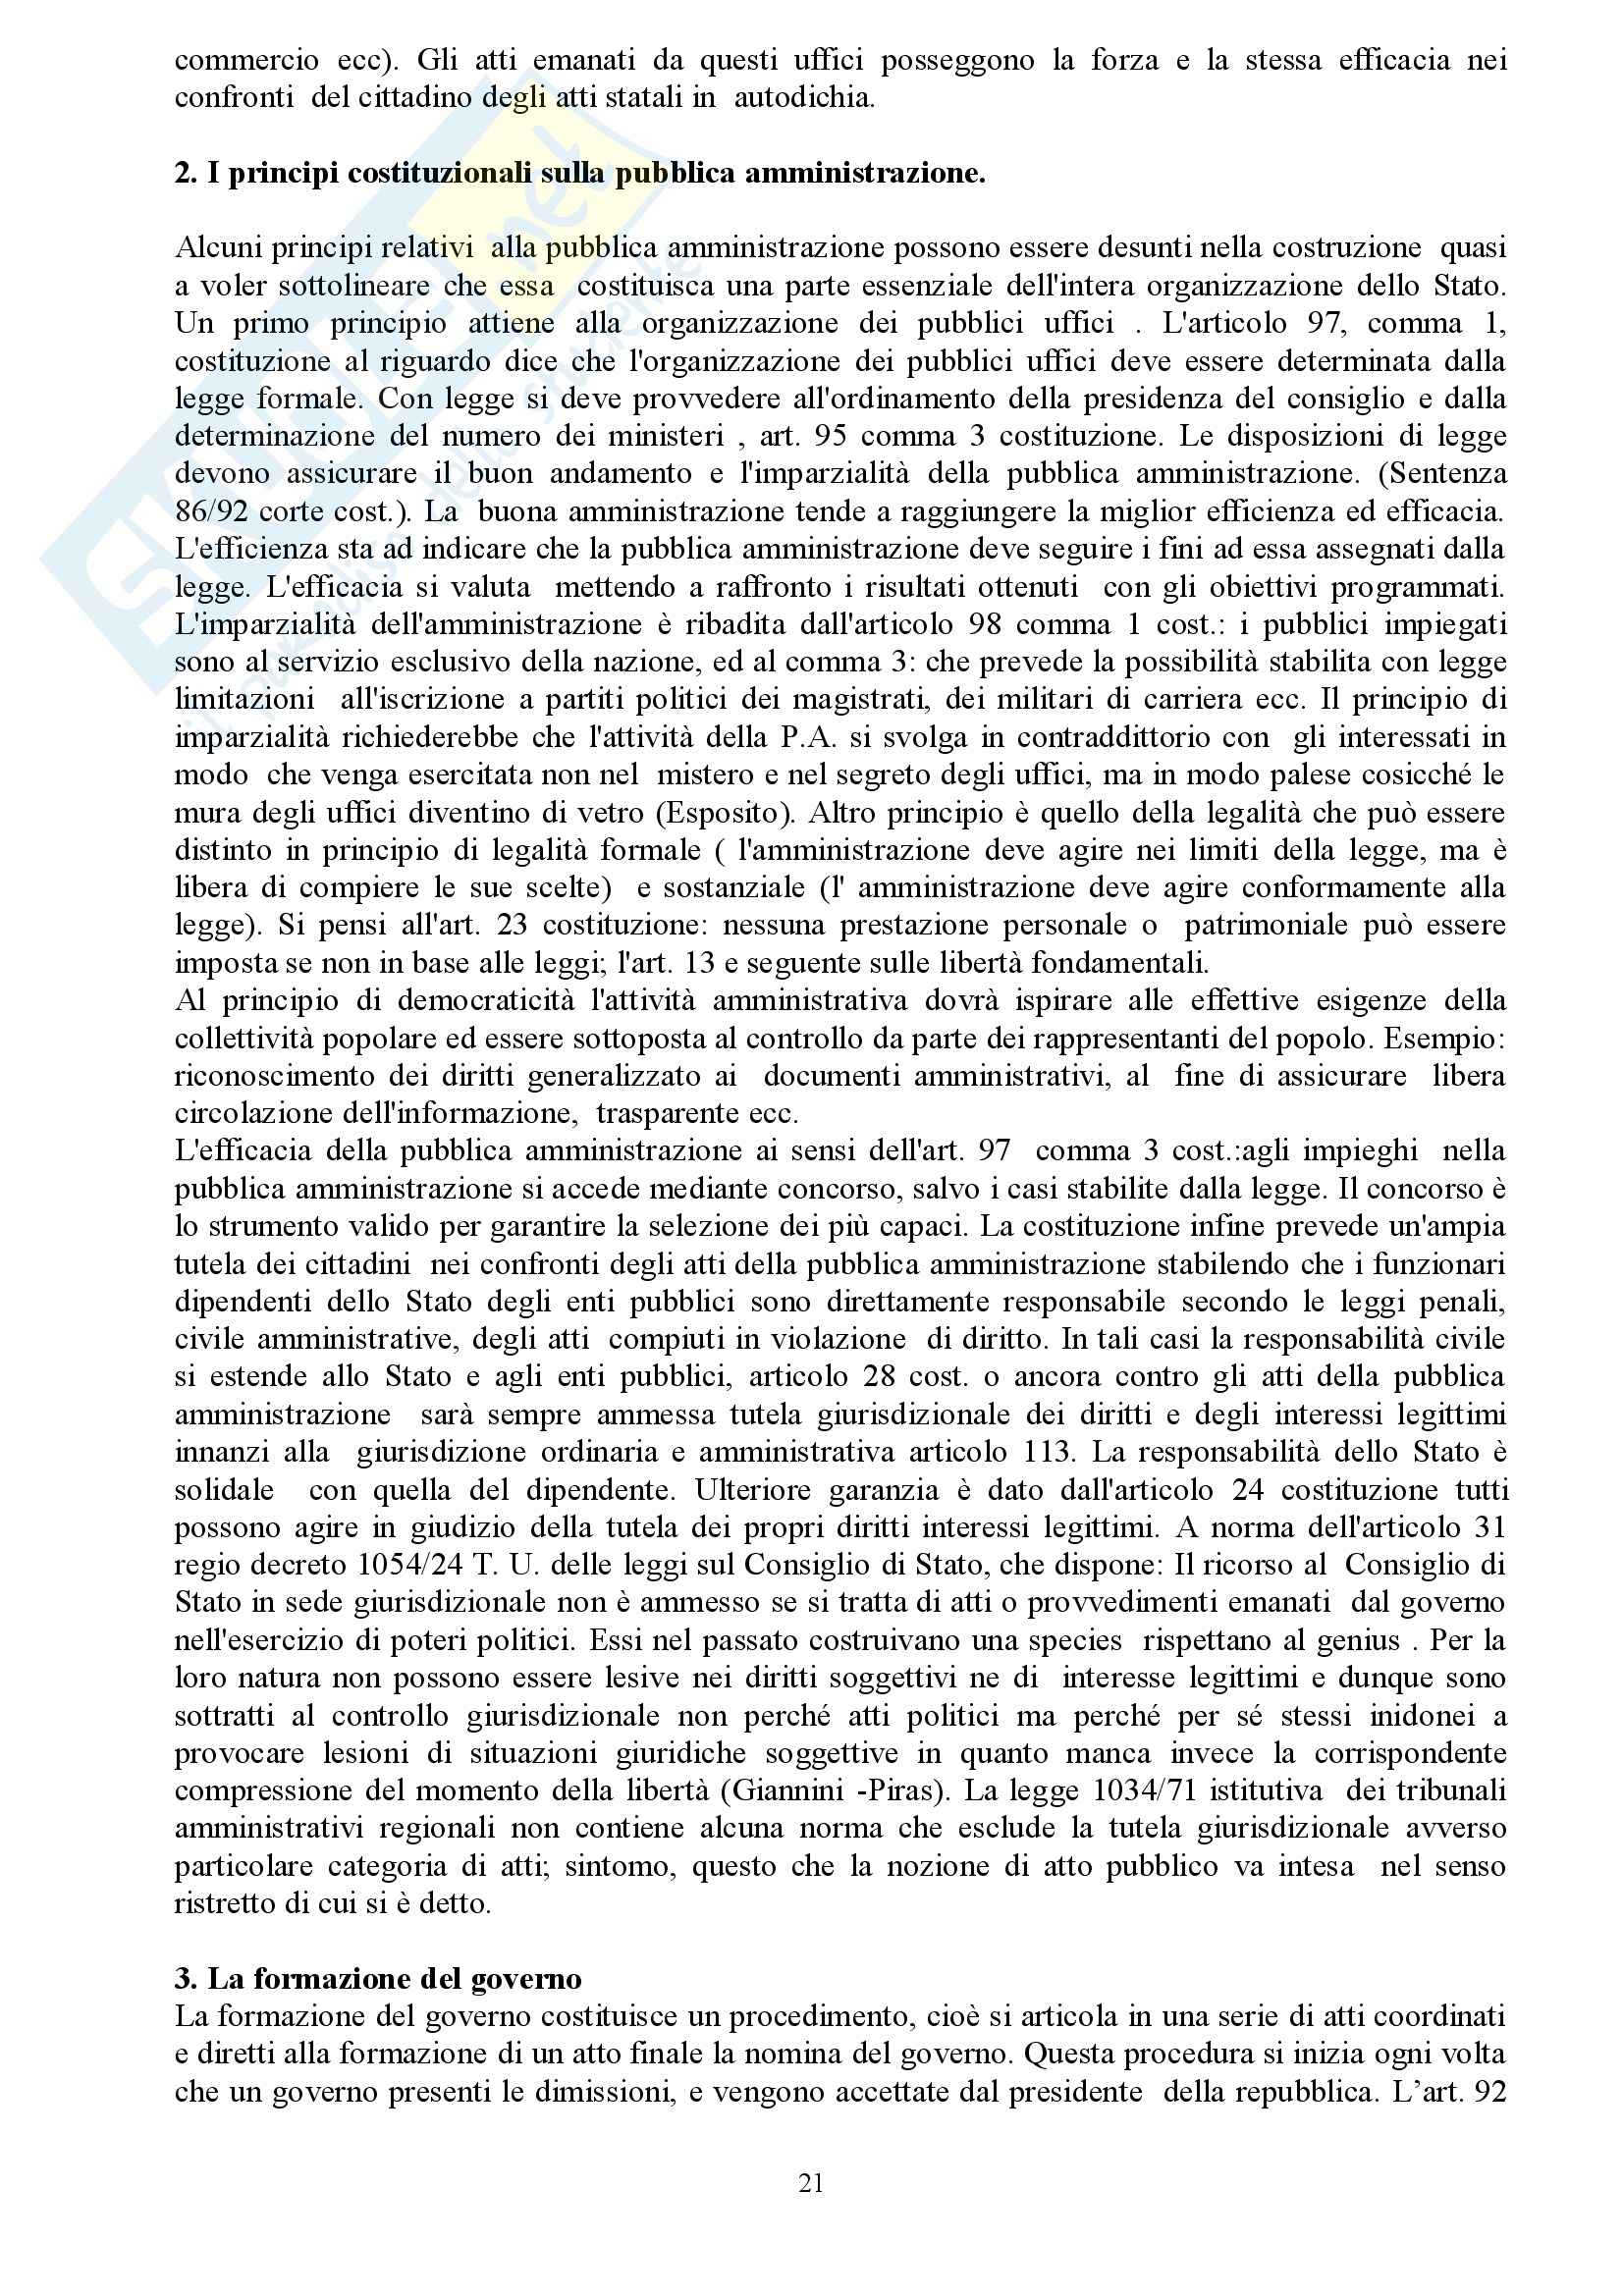 Riassunto esame Diritto Costituzionale, prof. indefinito, libro consigliato Diritto Costituzionale, Martines Pag. 21